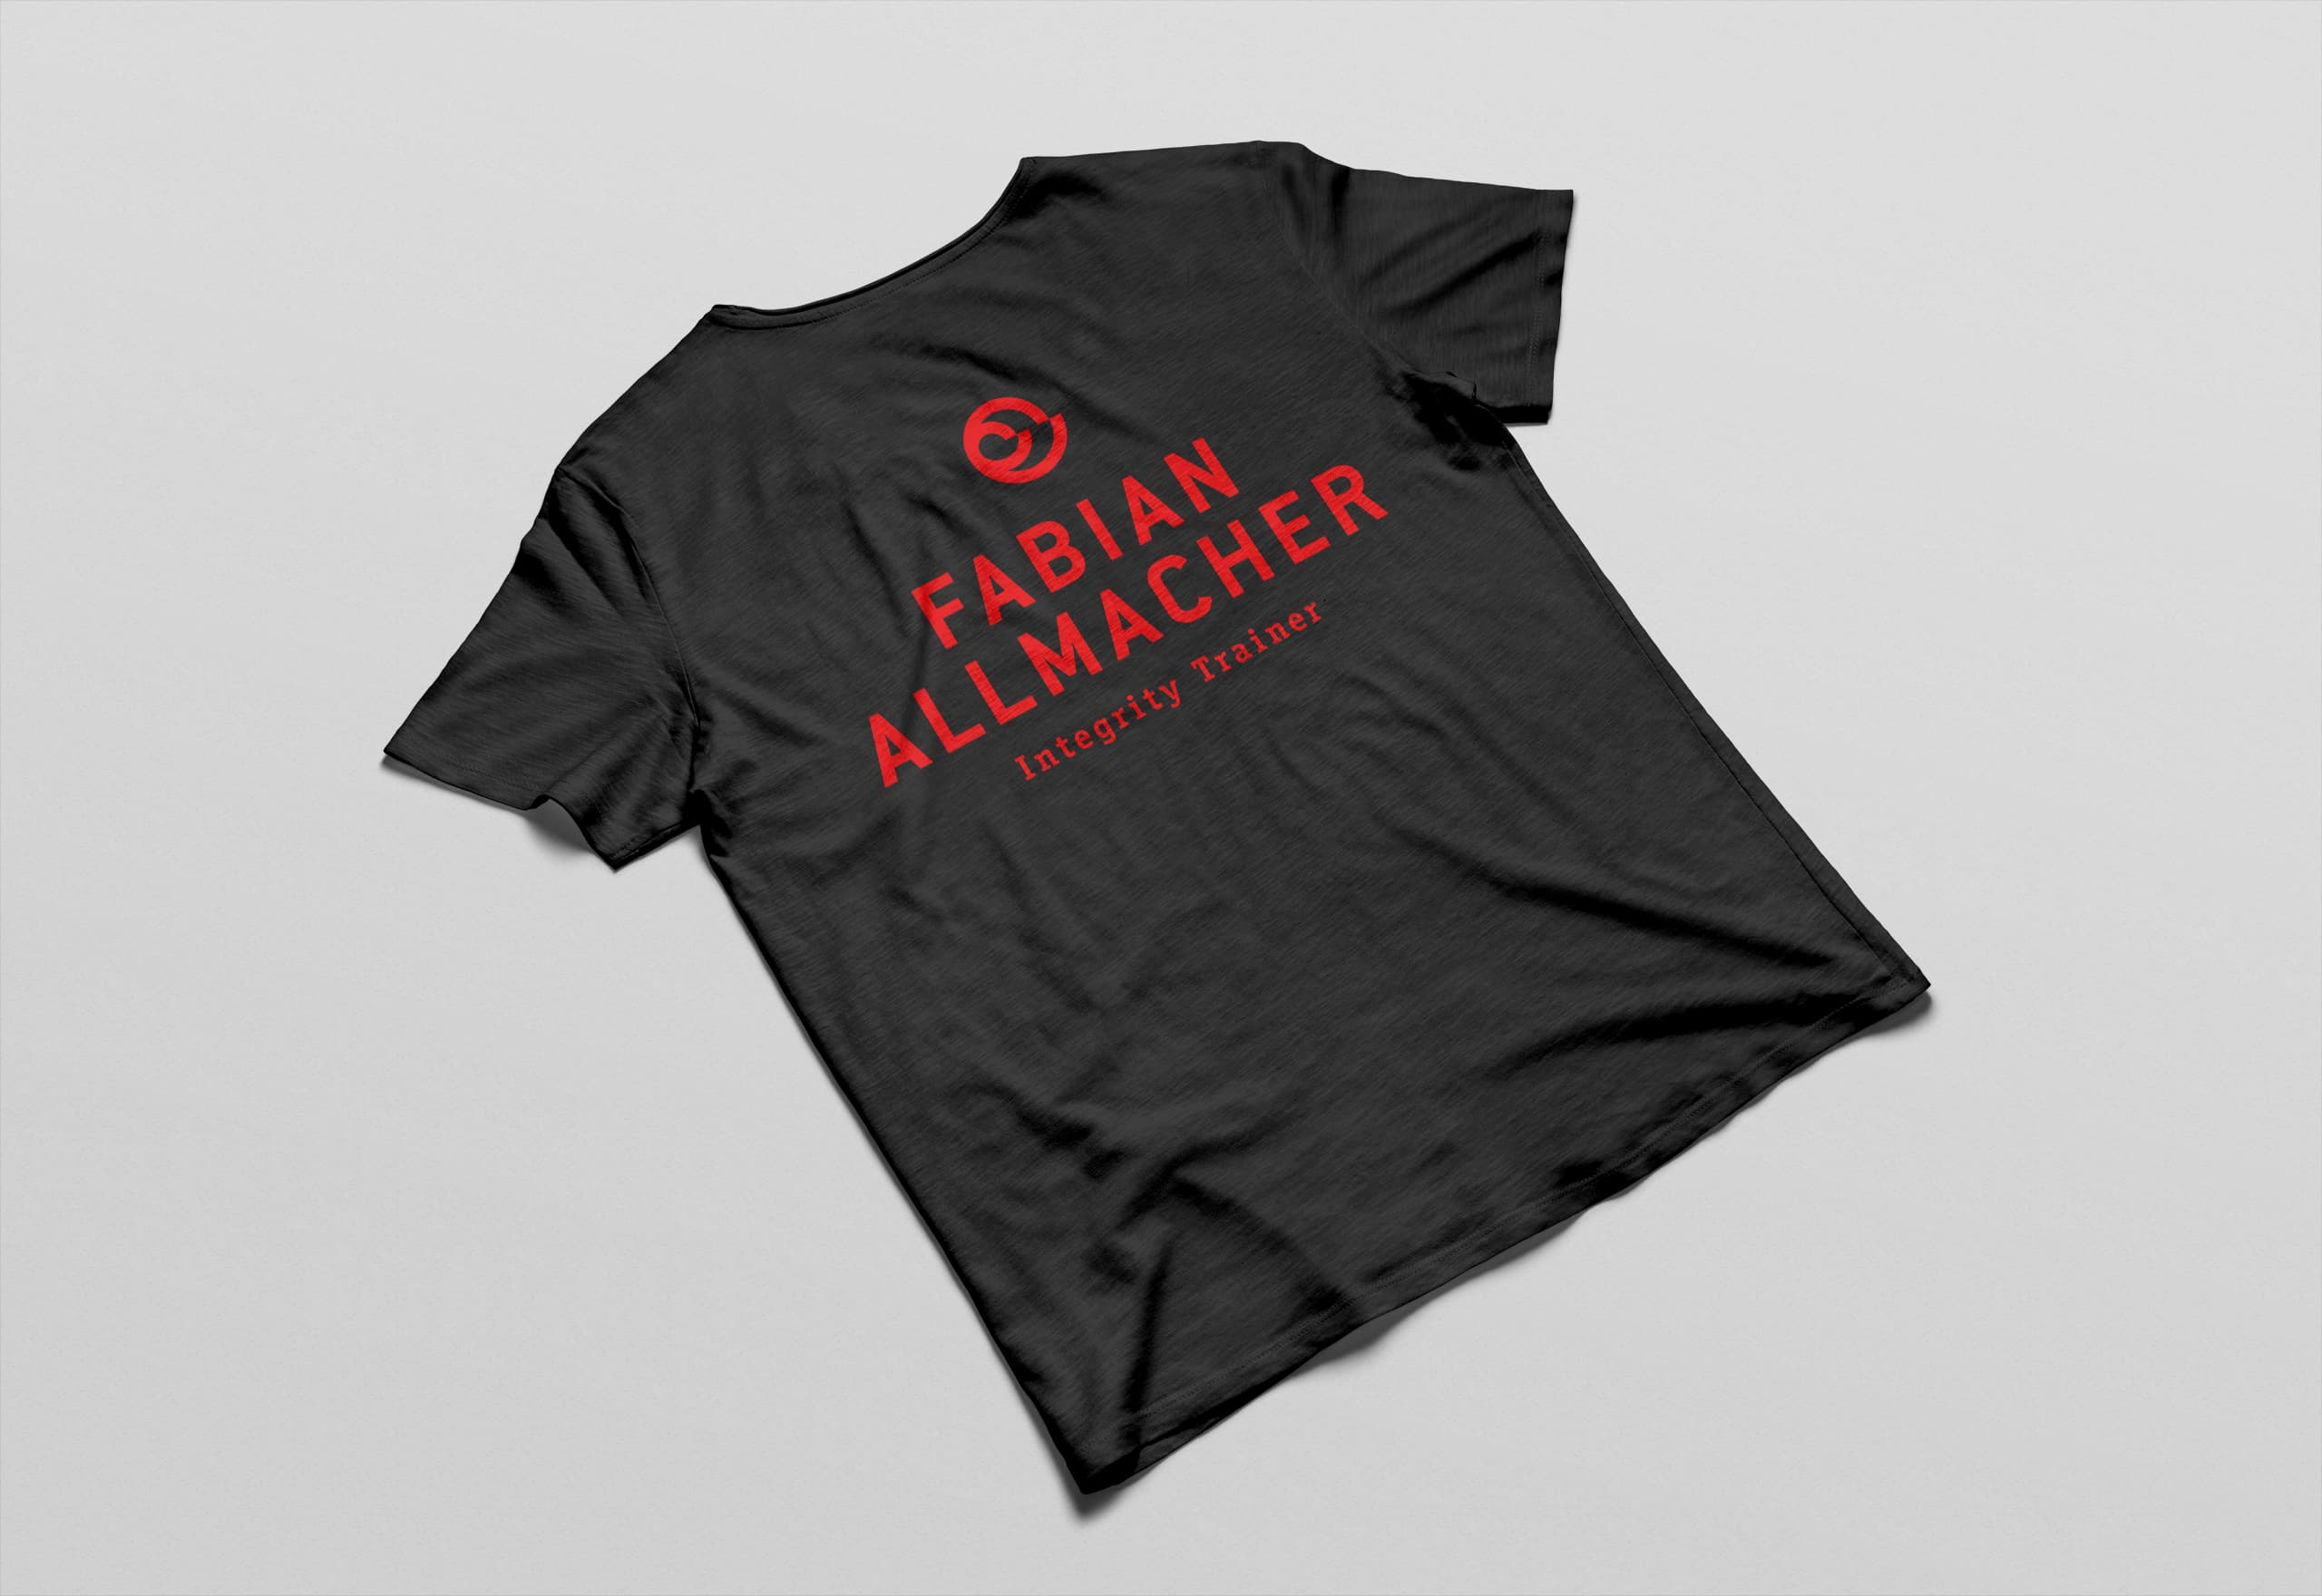 Design Fabian Allmacher